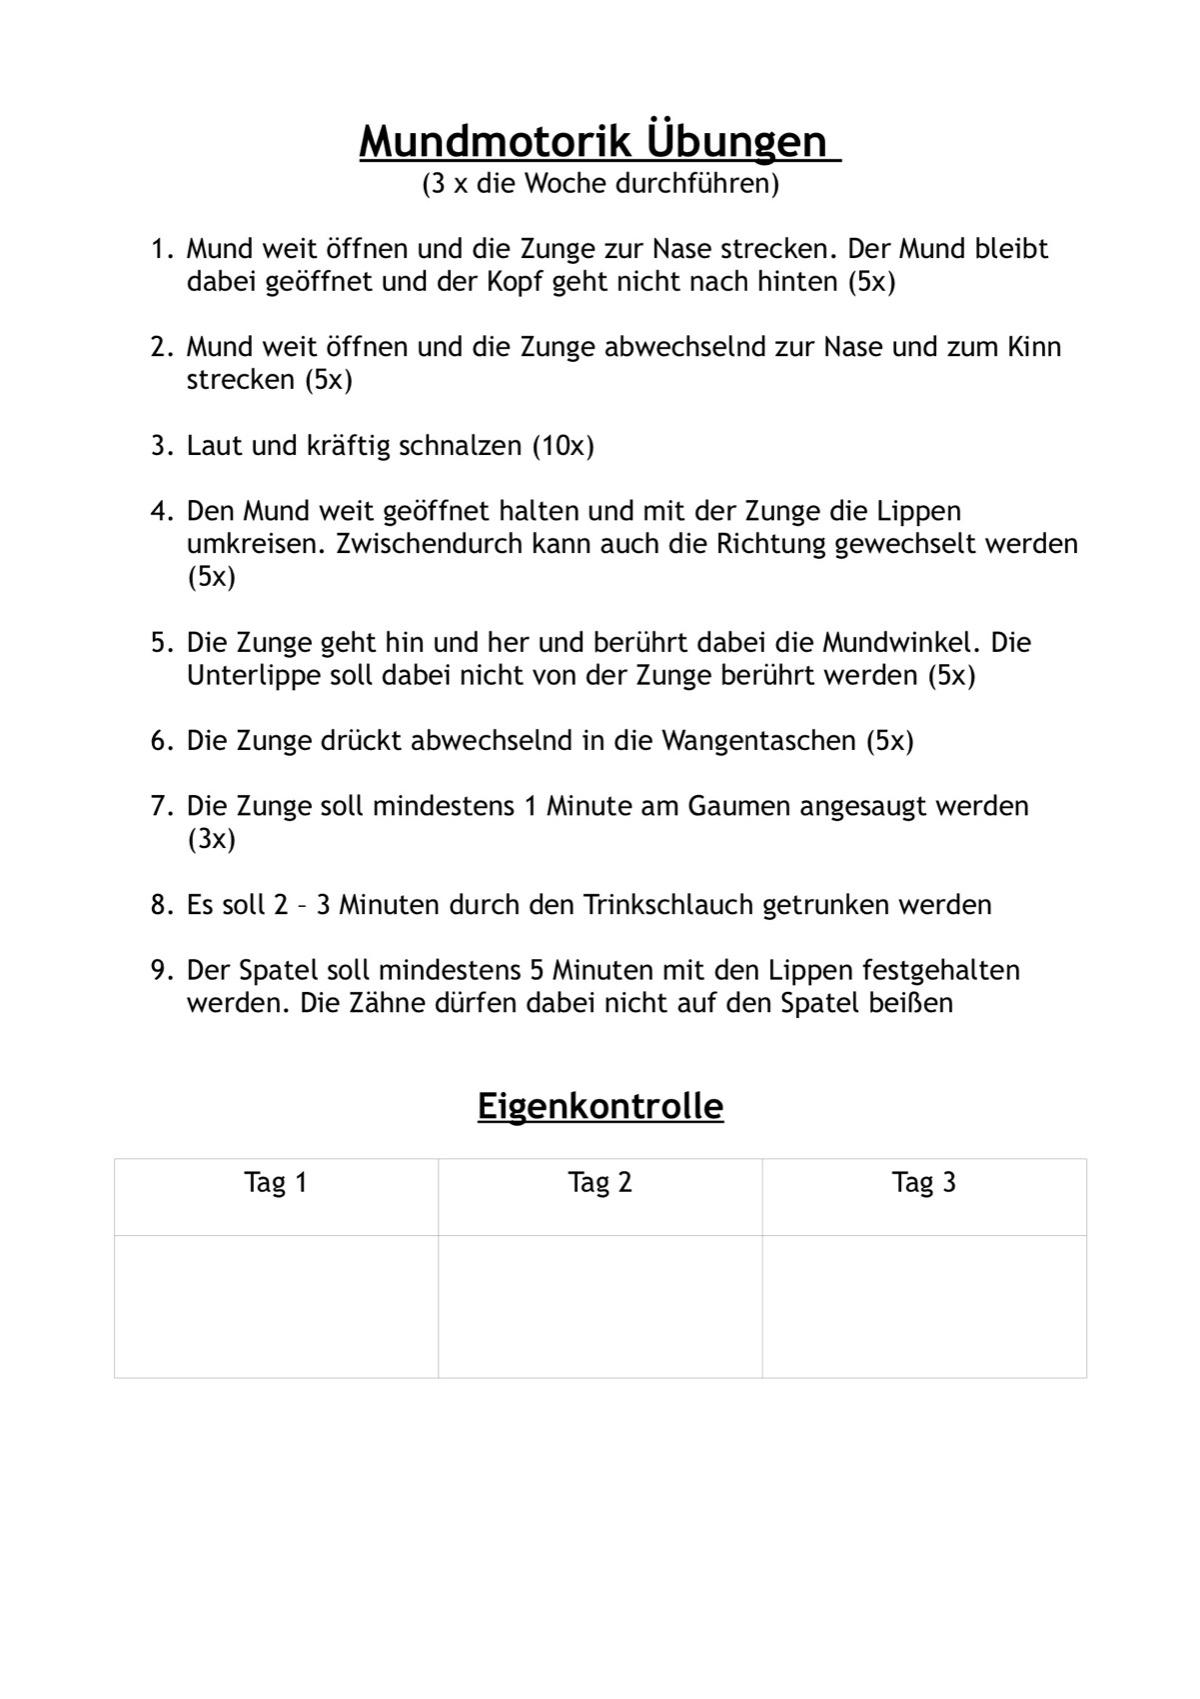 Arbeitsblatt Fehlersuche - LRS - madoo.net